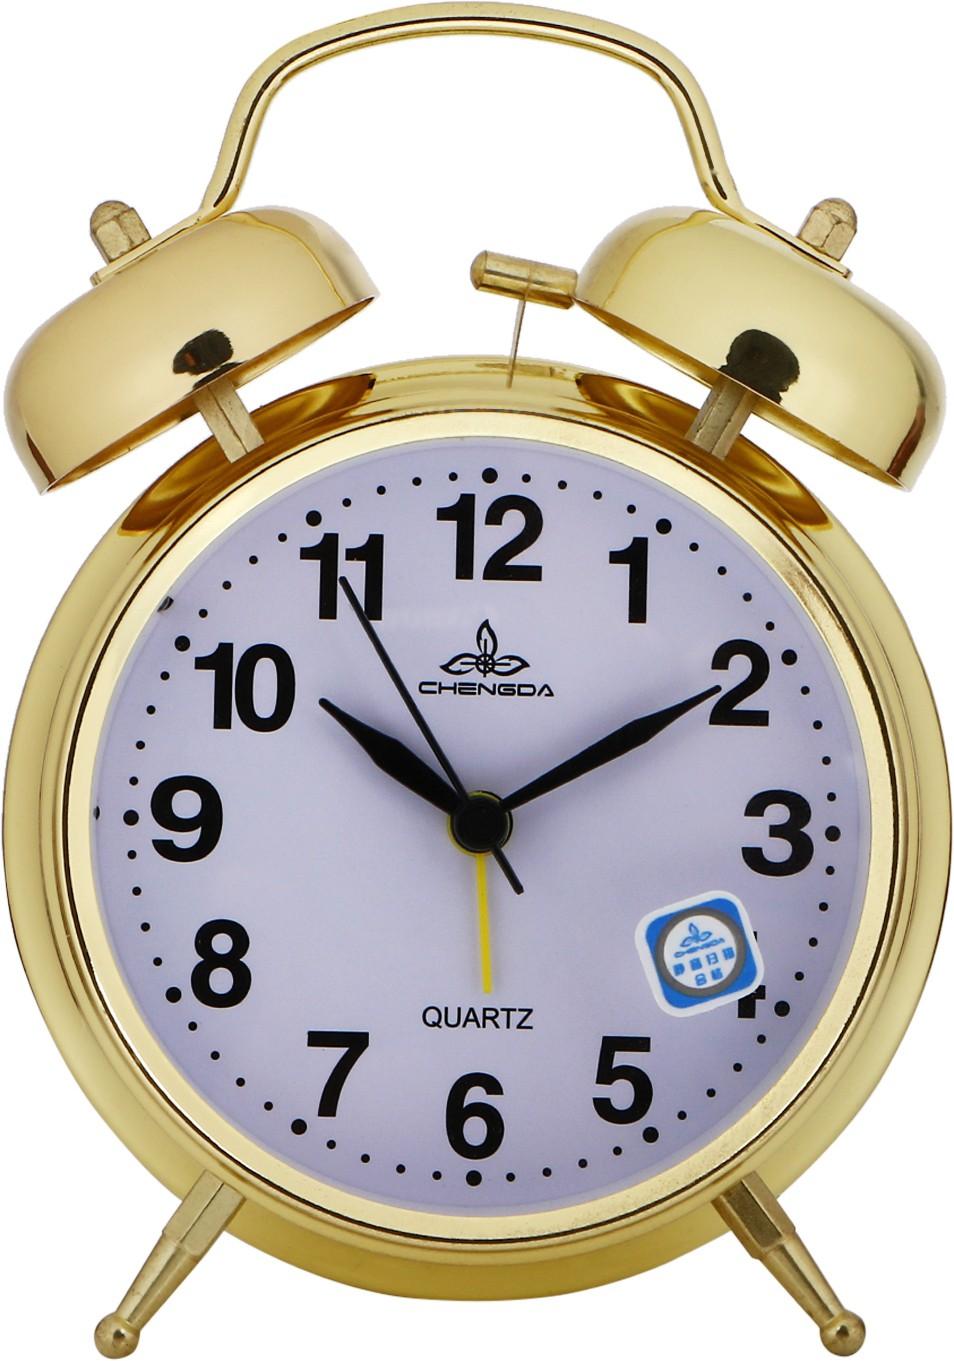 http://img.fkcdn.com/image/table-clock/v/q/y/sftcl-901-shopingfever-gracious-gold-original-imae6s6whsgyuthp.jpeg